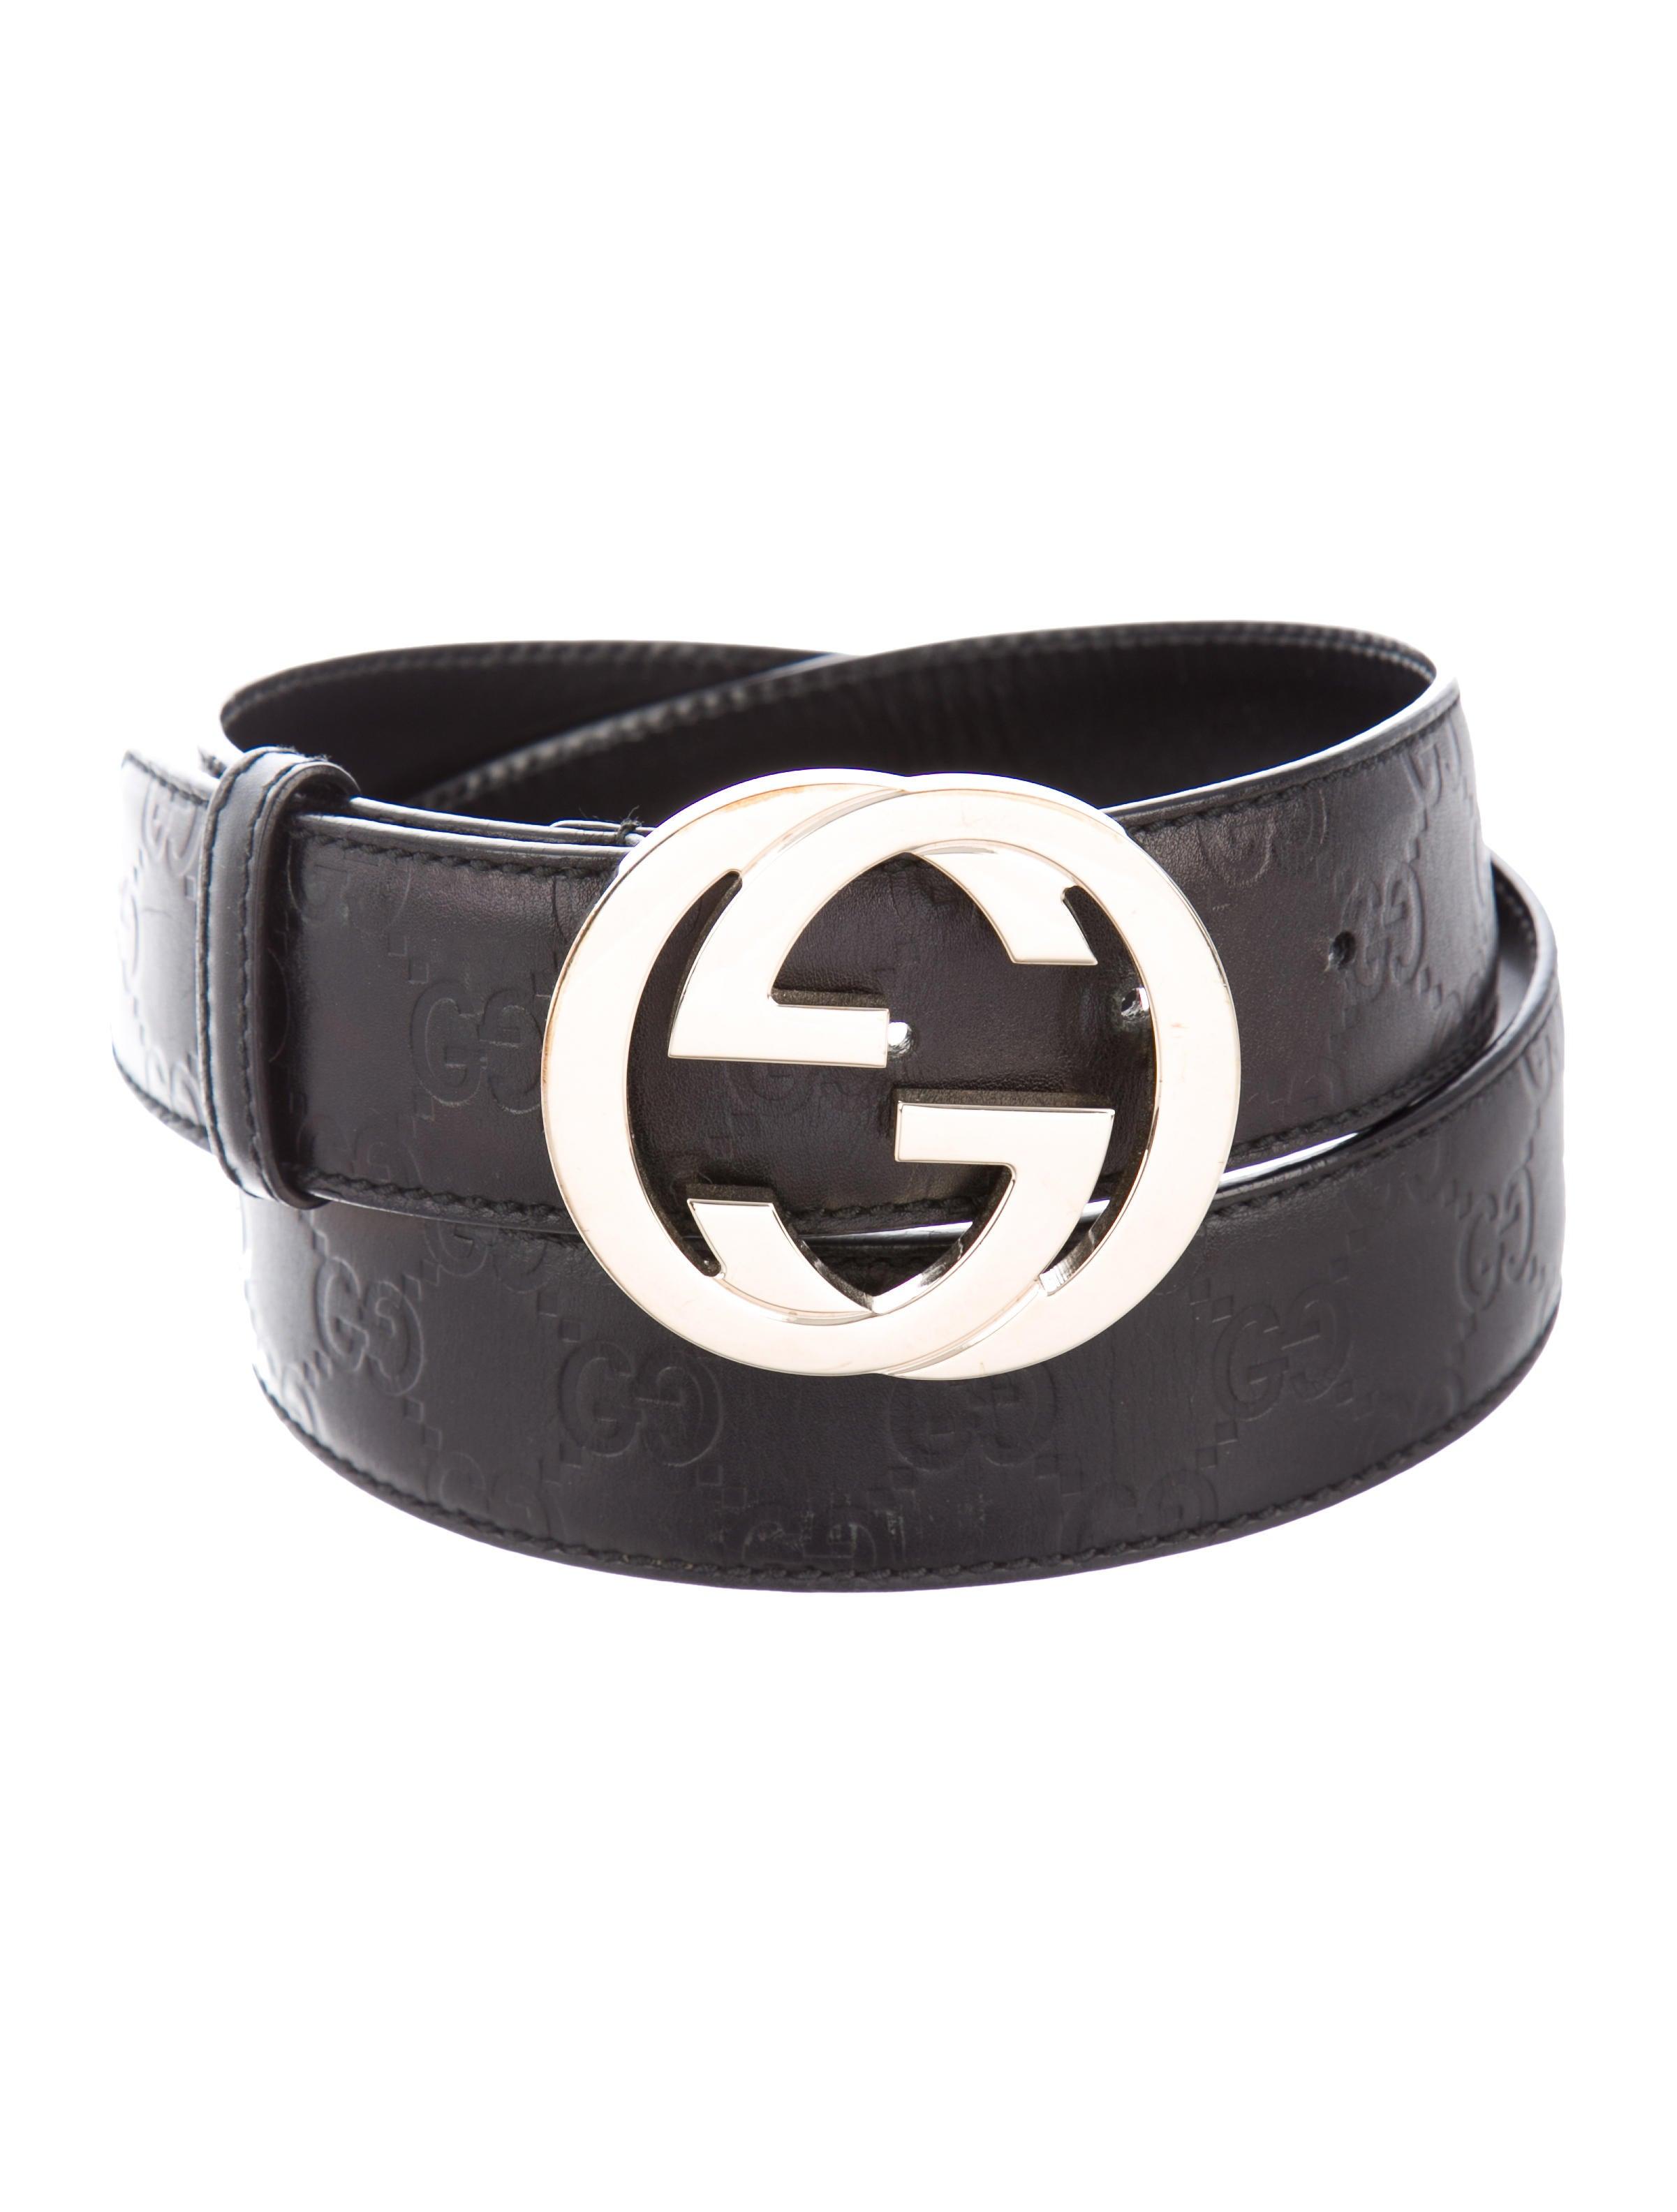 ef136e24721 Gucci Leather GG waist Belt - Accessories - GUC304333